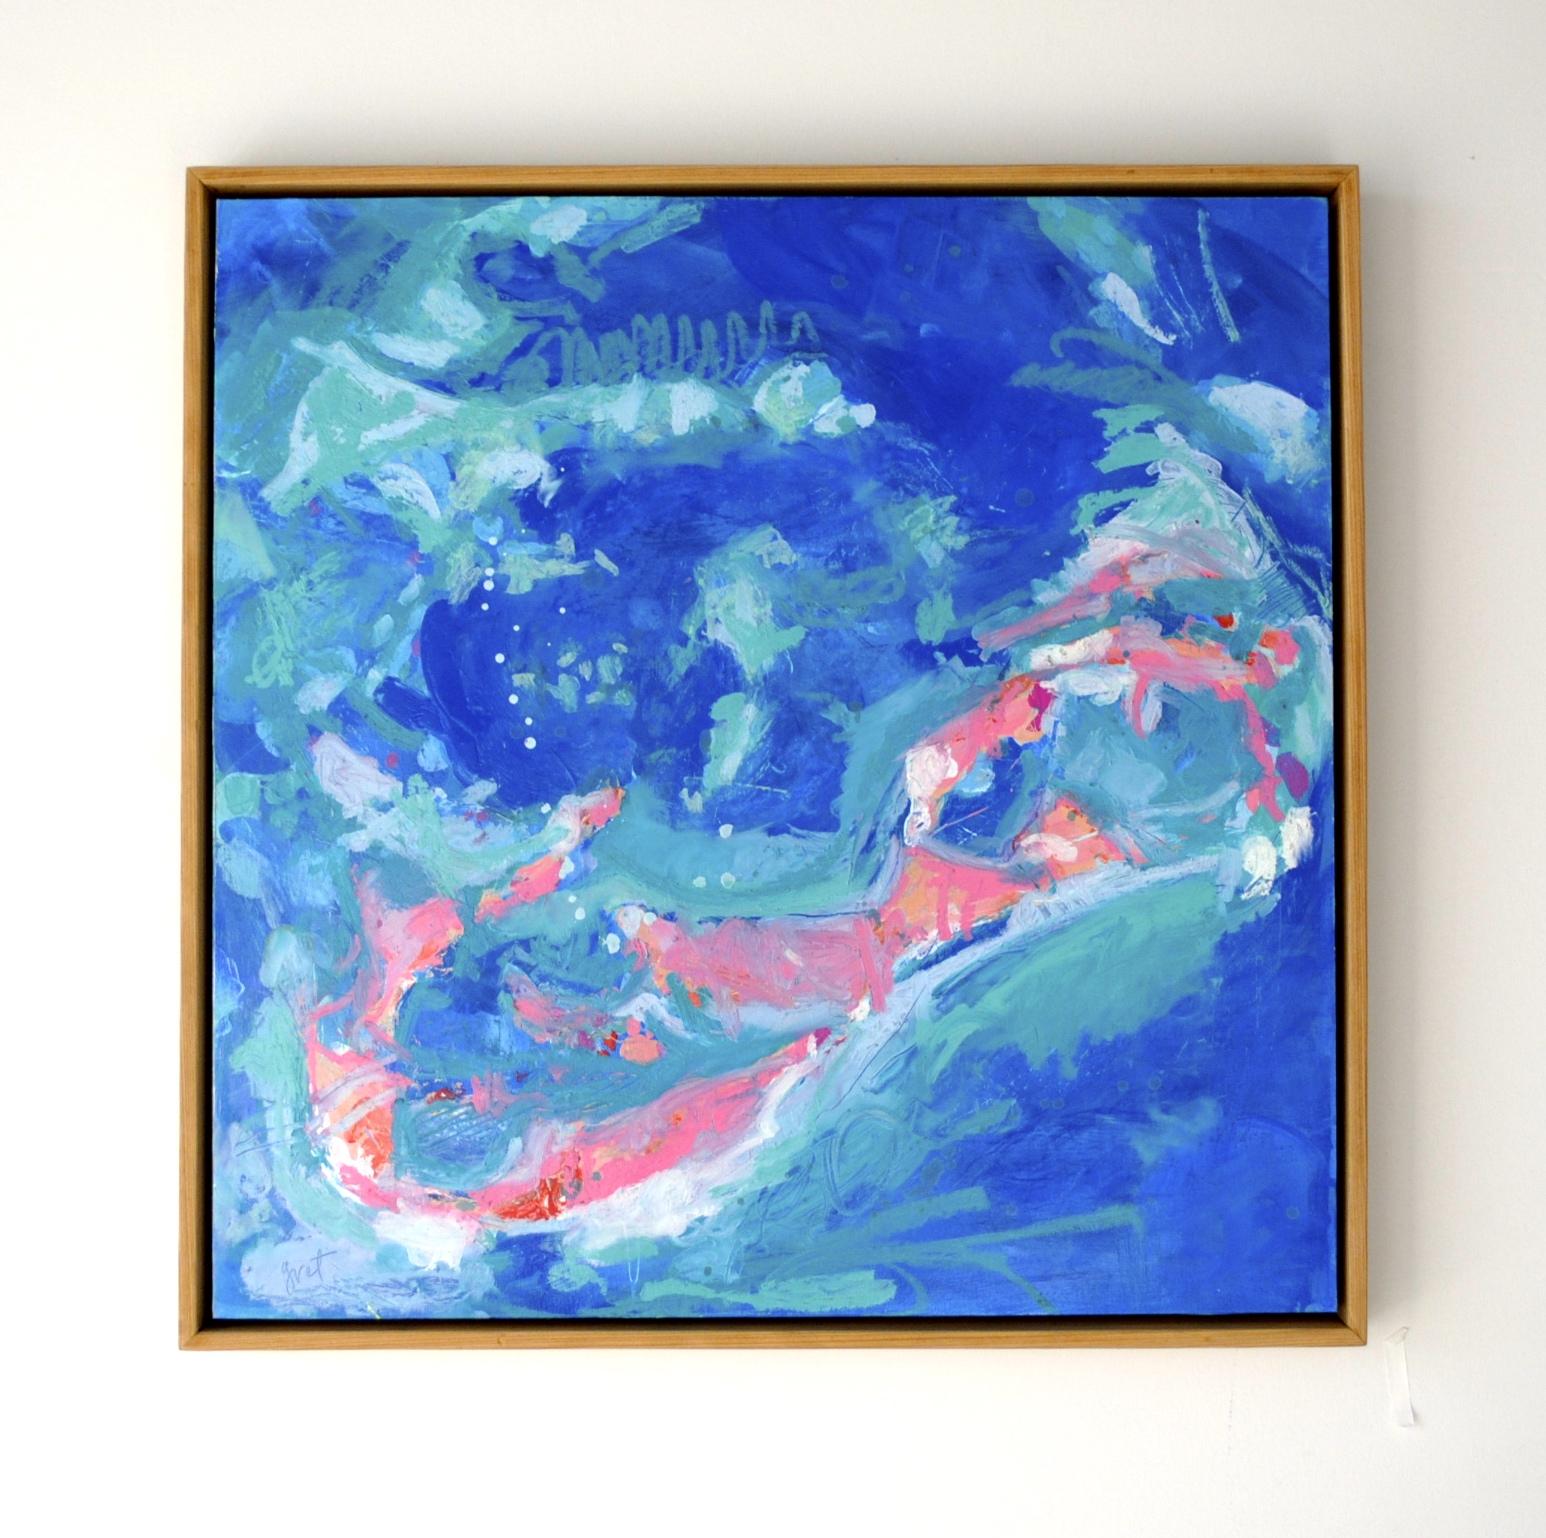 """Bermudaful"" - 25 x 25 - acrylic and oil stick on wood panel"